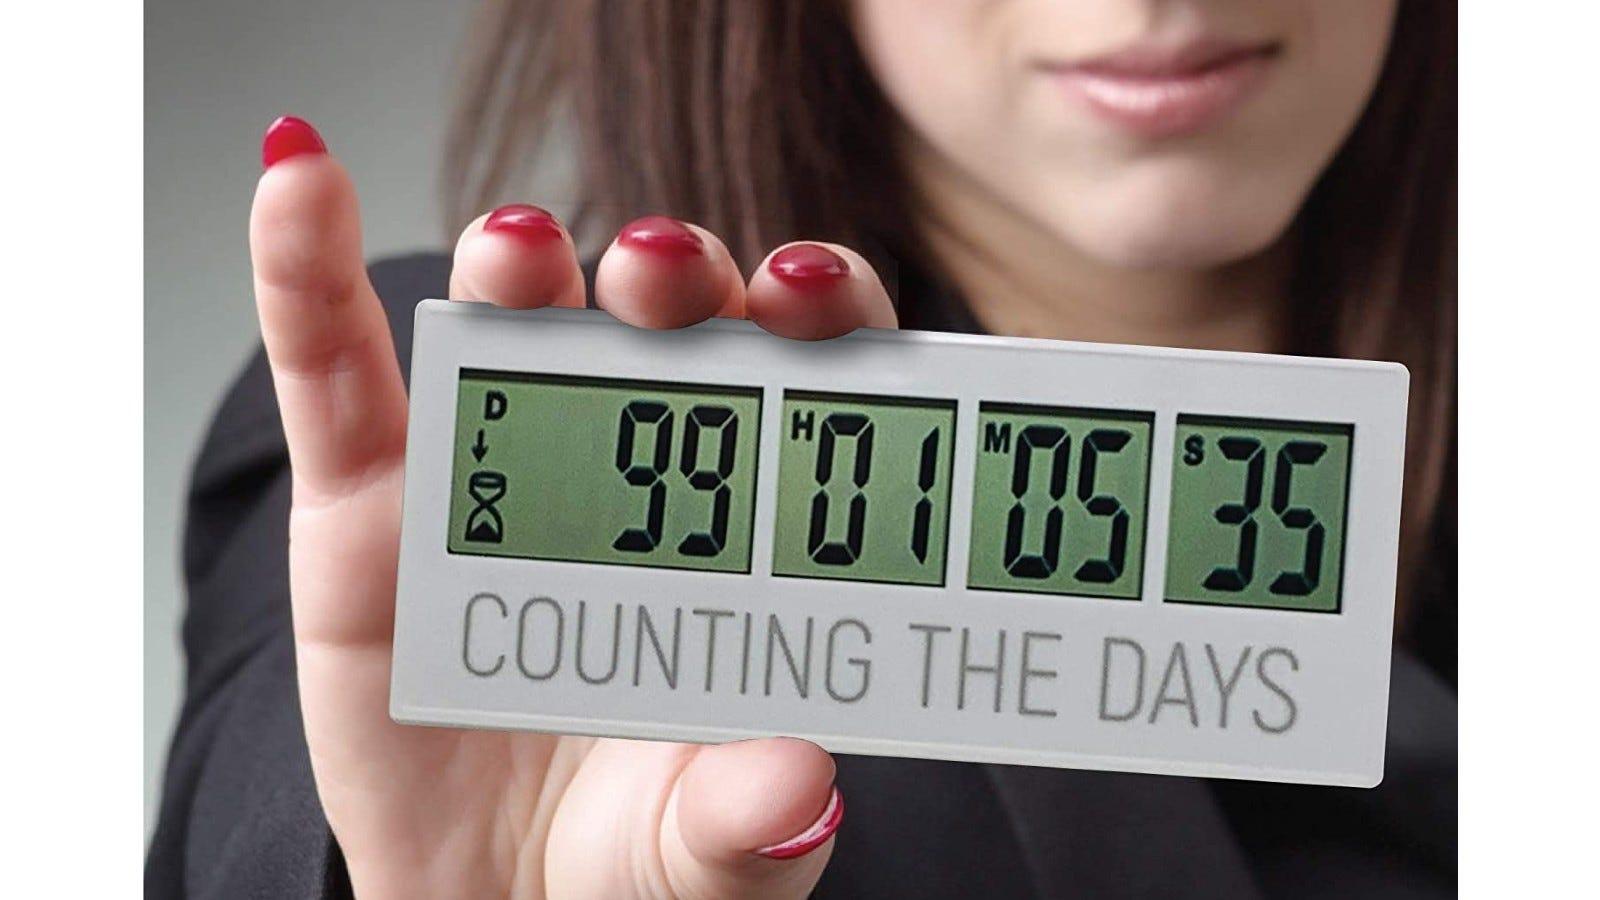 This countdown timer has large digital display screen